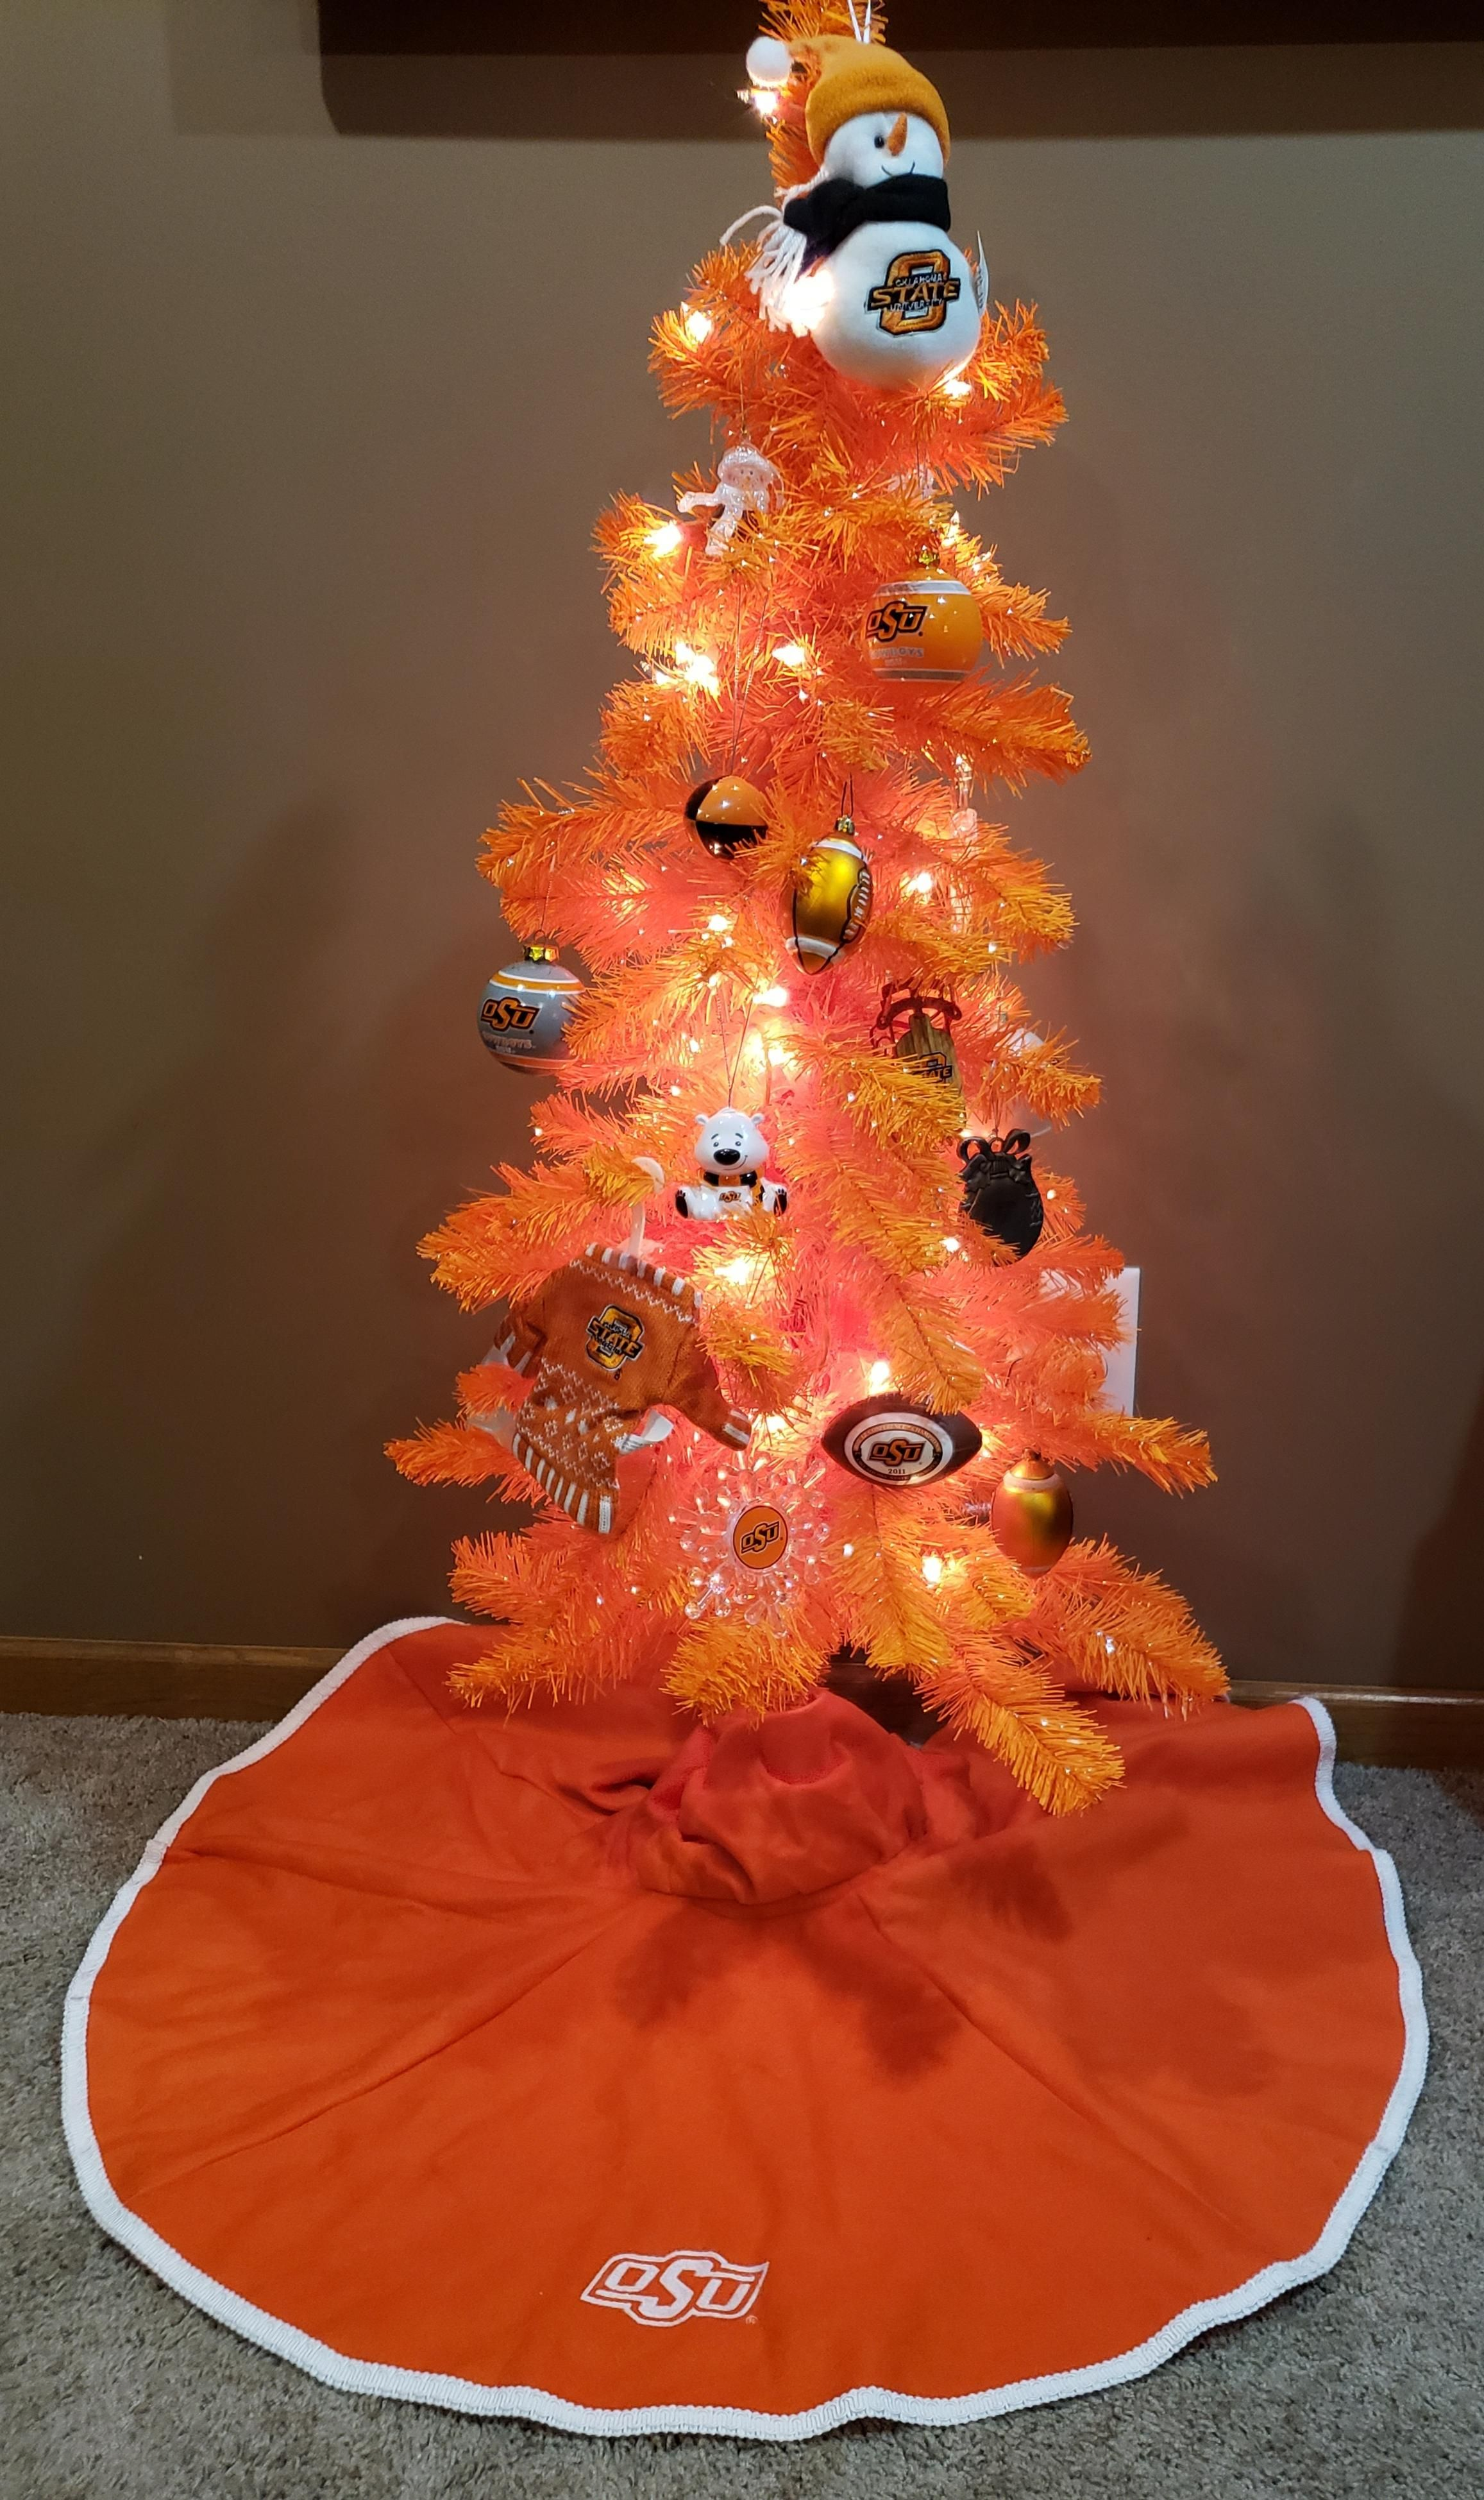 OSU Oklahoma State University Tree Skirt LARGE